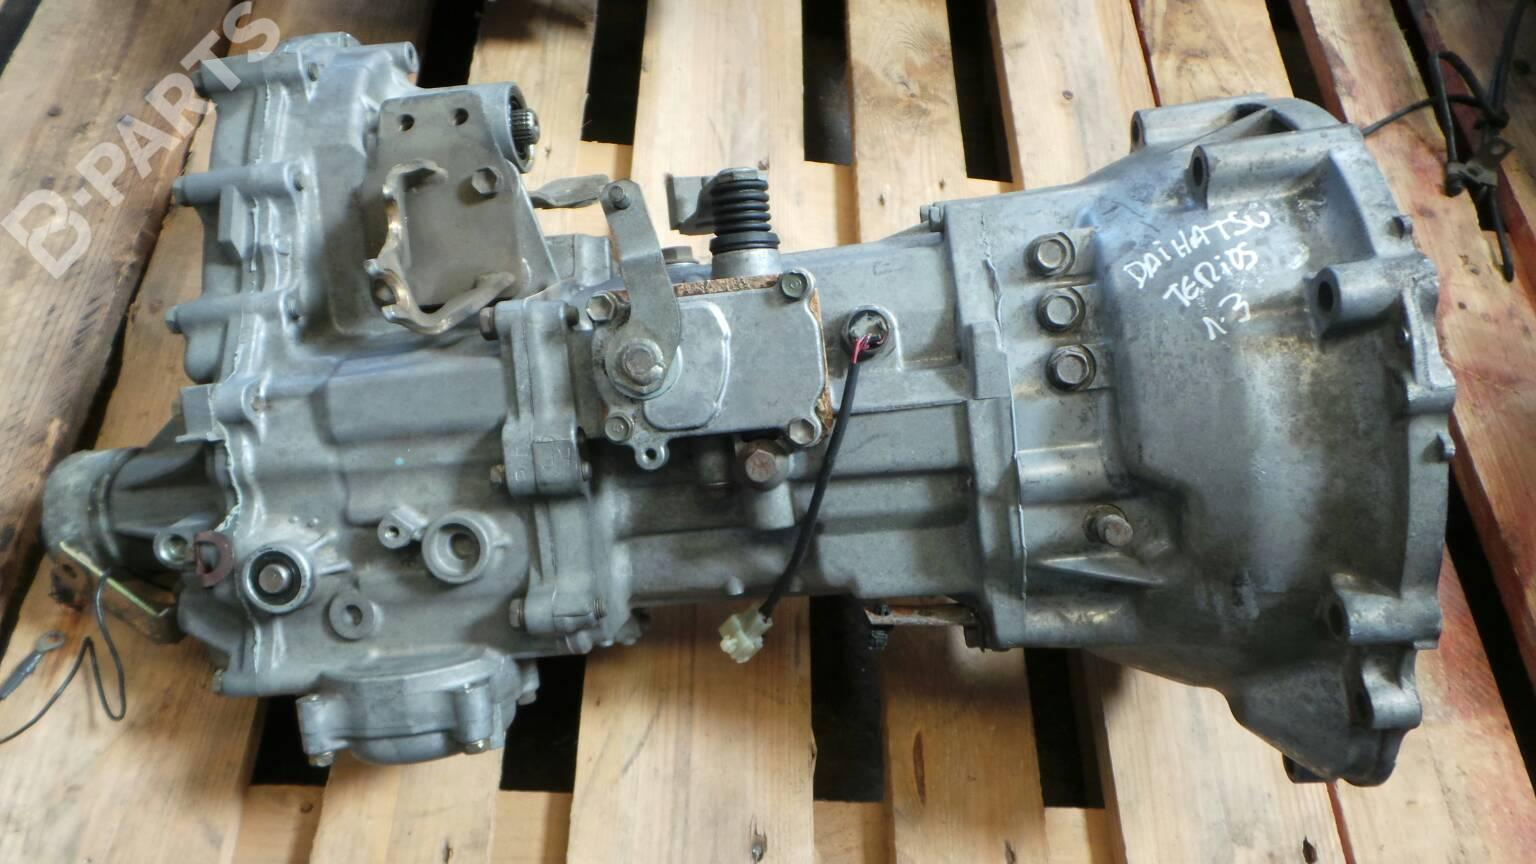 ... Manual Gearbox DAIHATSU, TERIOS (J1_) 1.3 4WD (J100) (83hp)